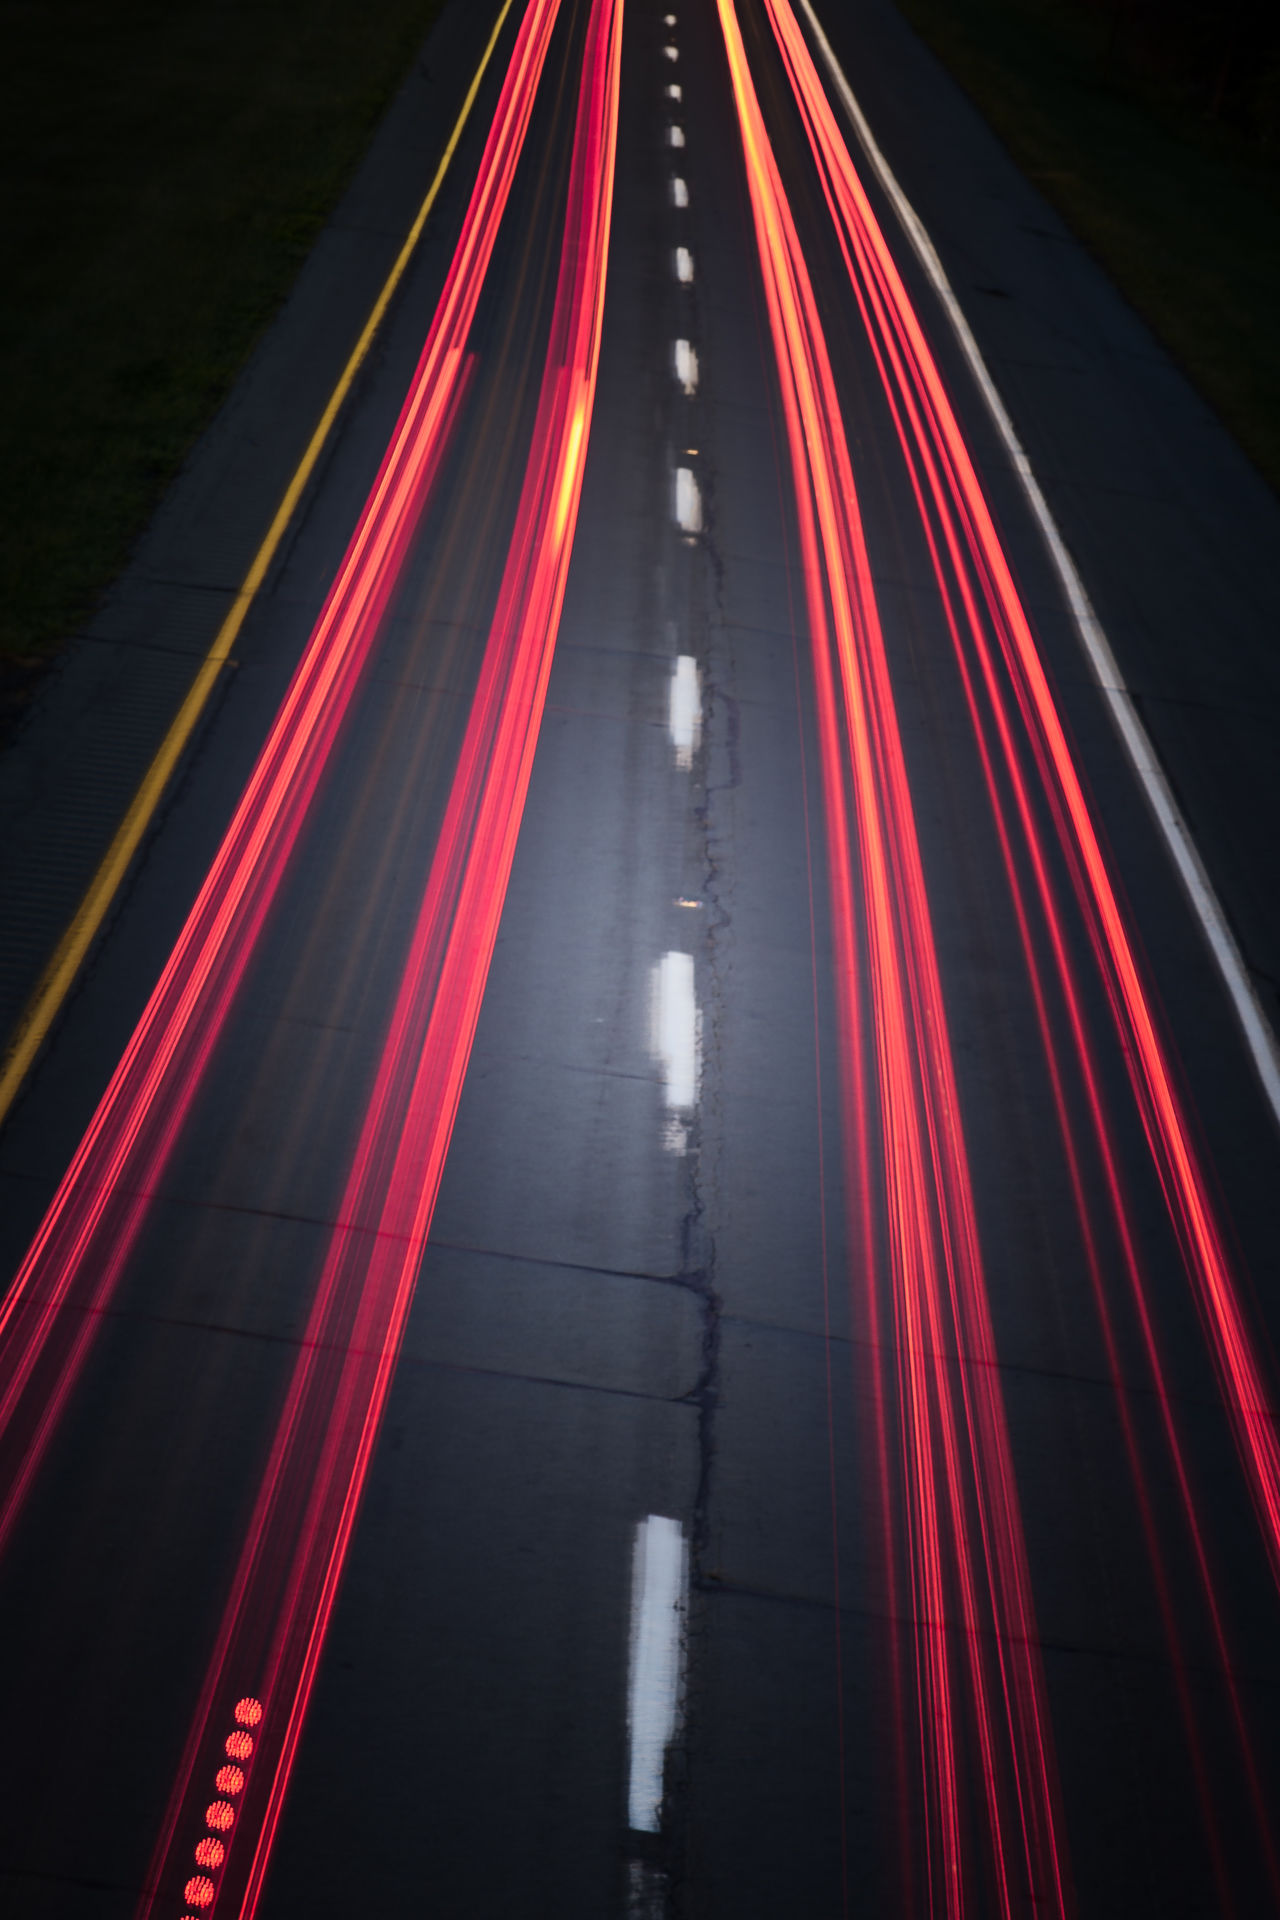 night light trail illuminated Traffic speed long exposure Red City Transportation Road motion City Life street car City Street Lighting equipment vehicle light land vehicle Rush Hour the way forward The City Light